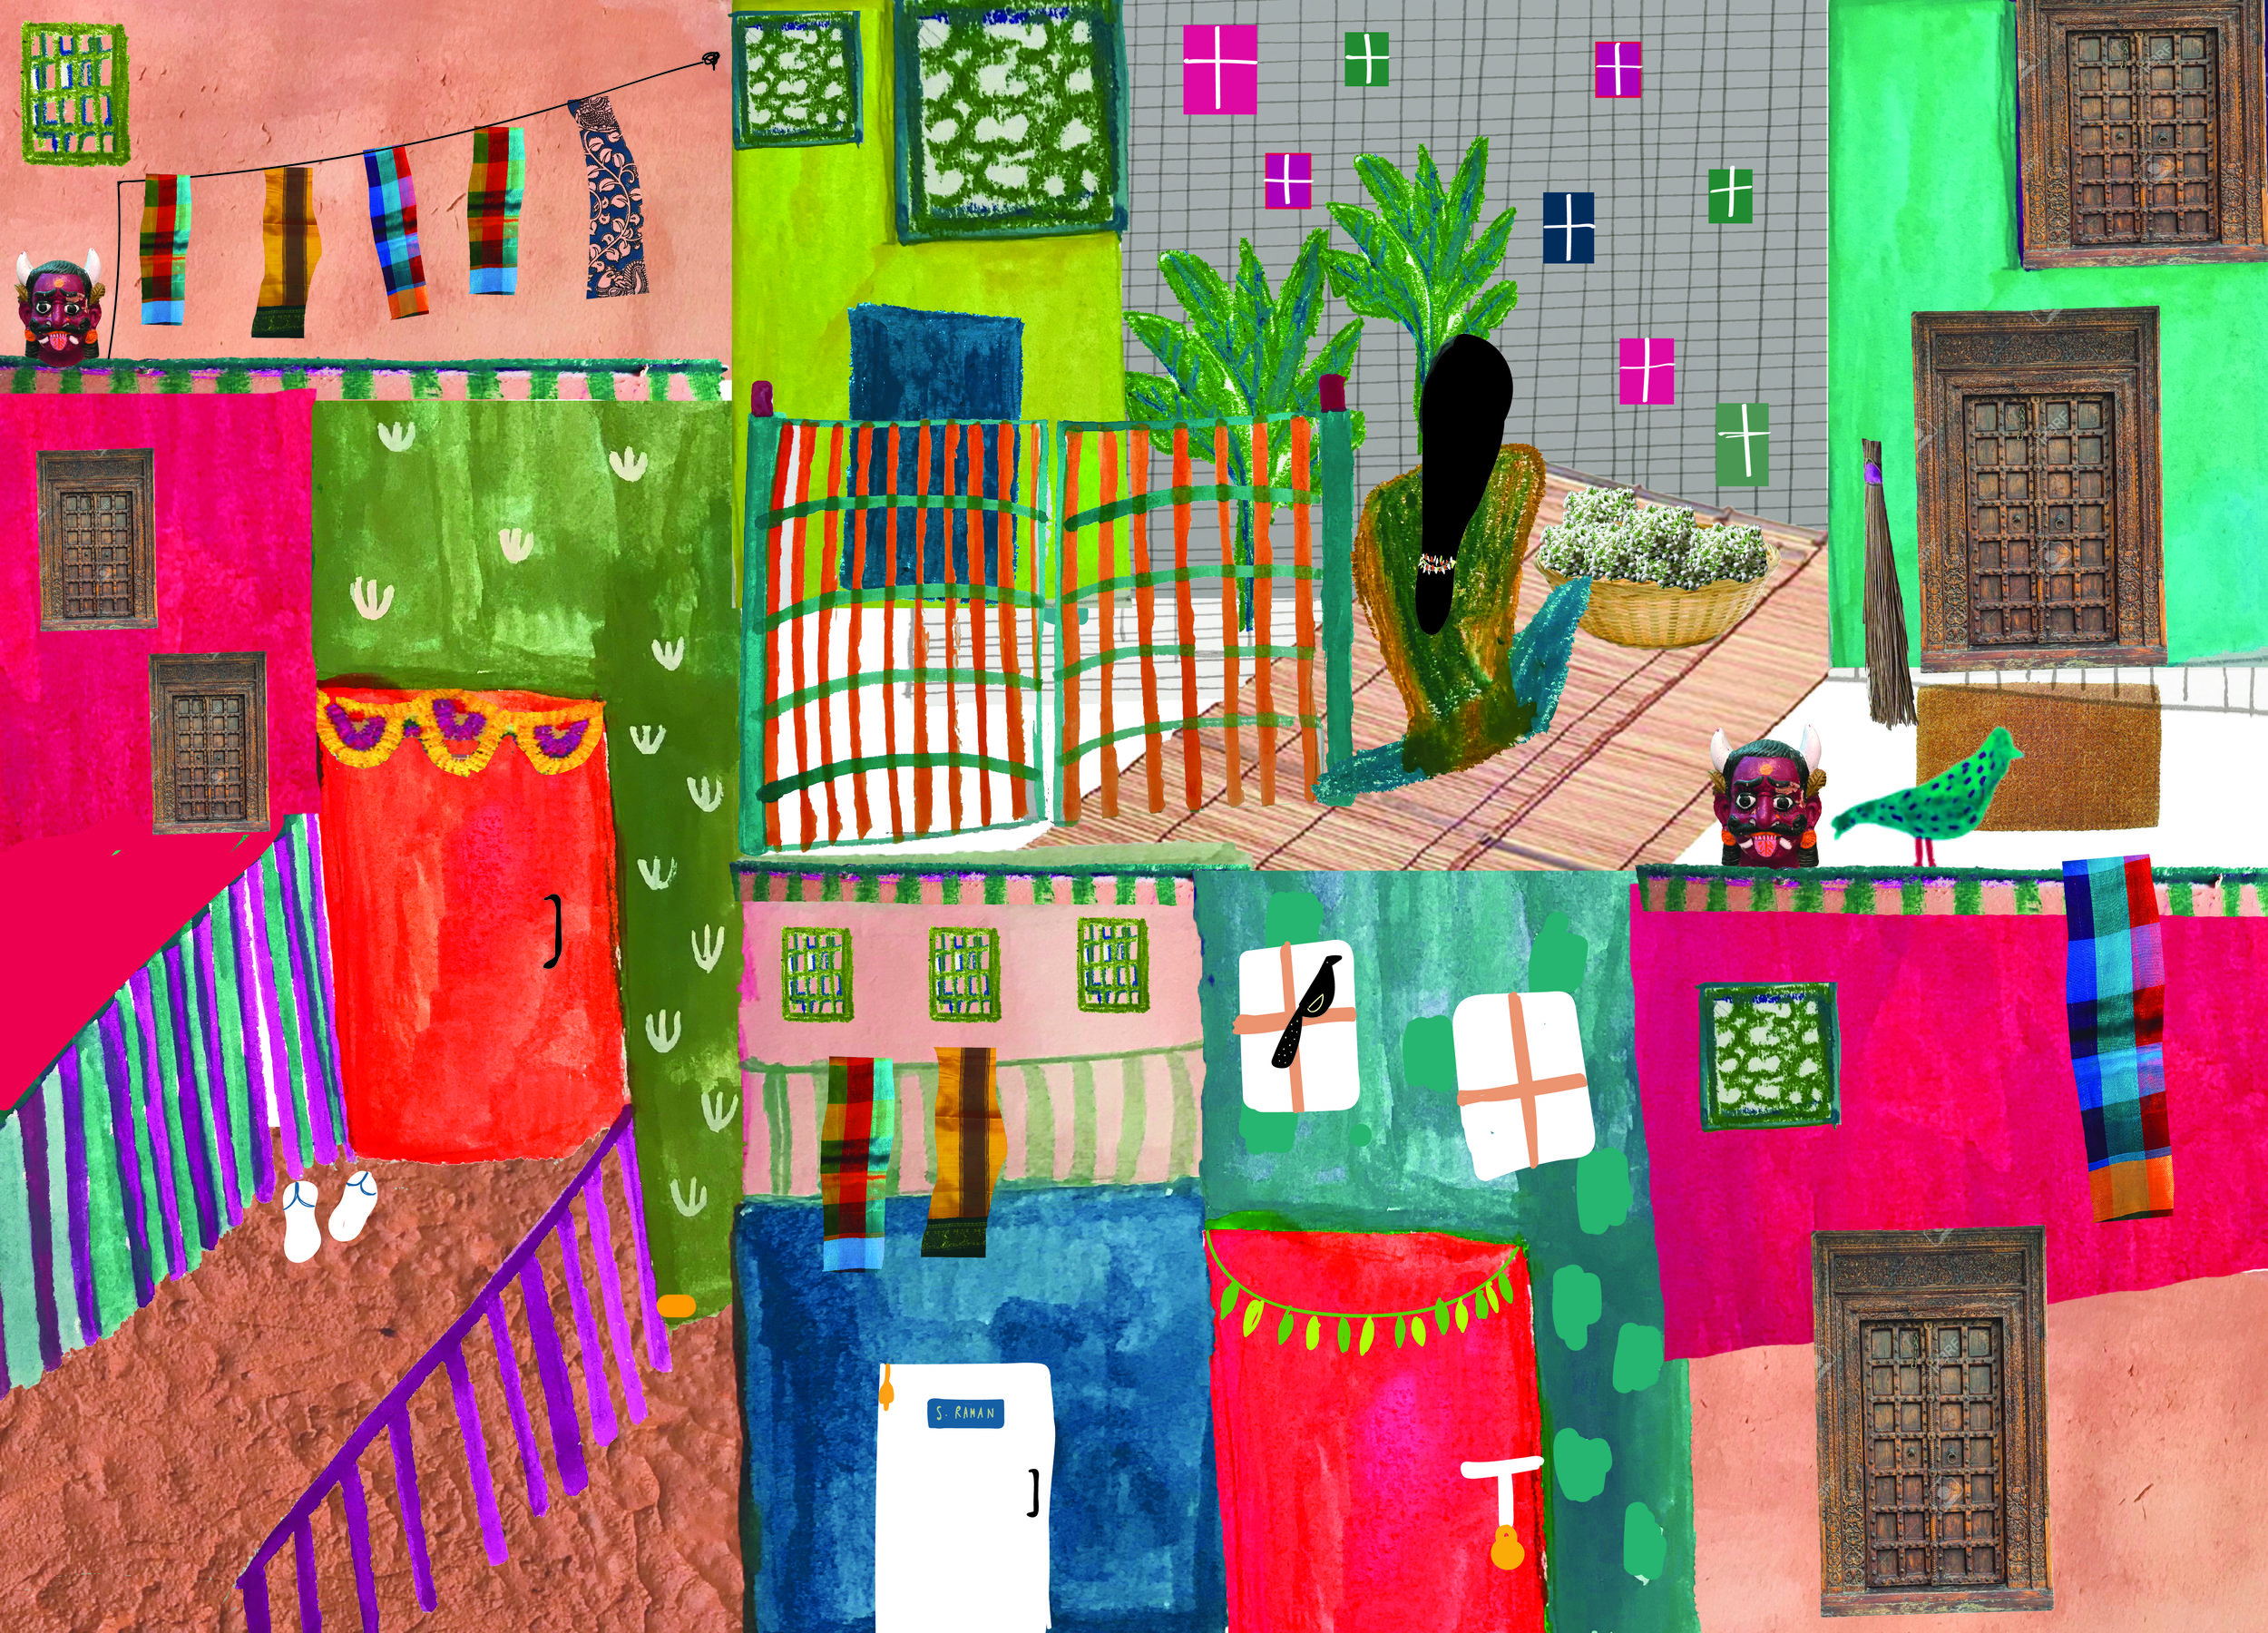 Illustration by Ananya Broker Parekh